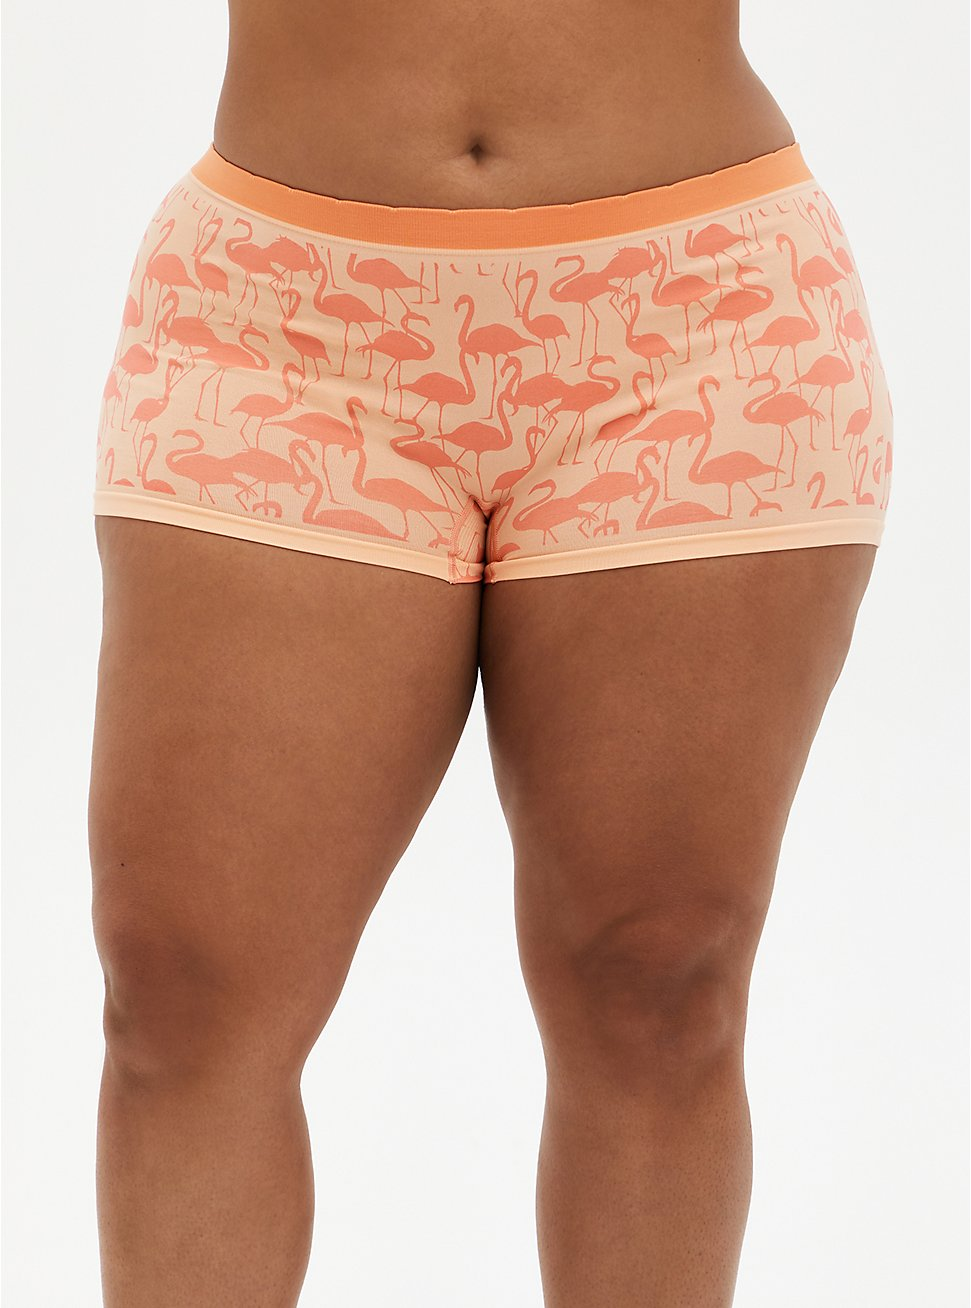 Seamless Boyshort Panty - Flamingo Coral, Flamingo Party- CORAL, hi-res